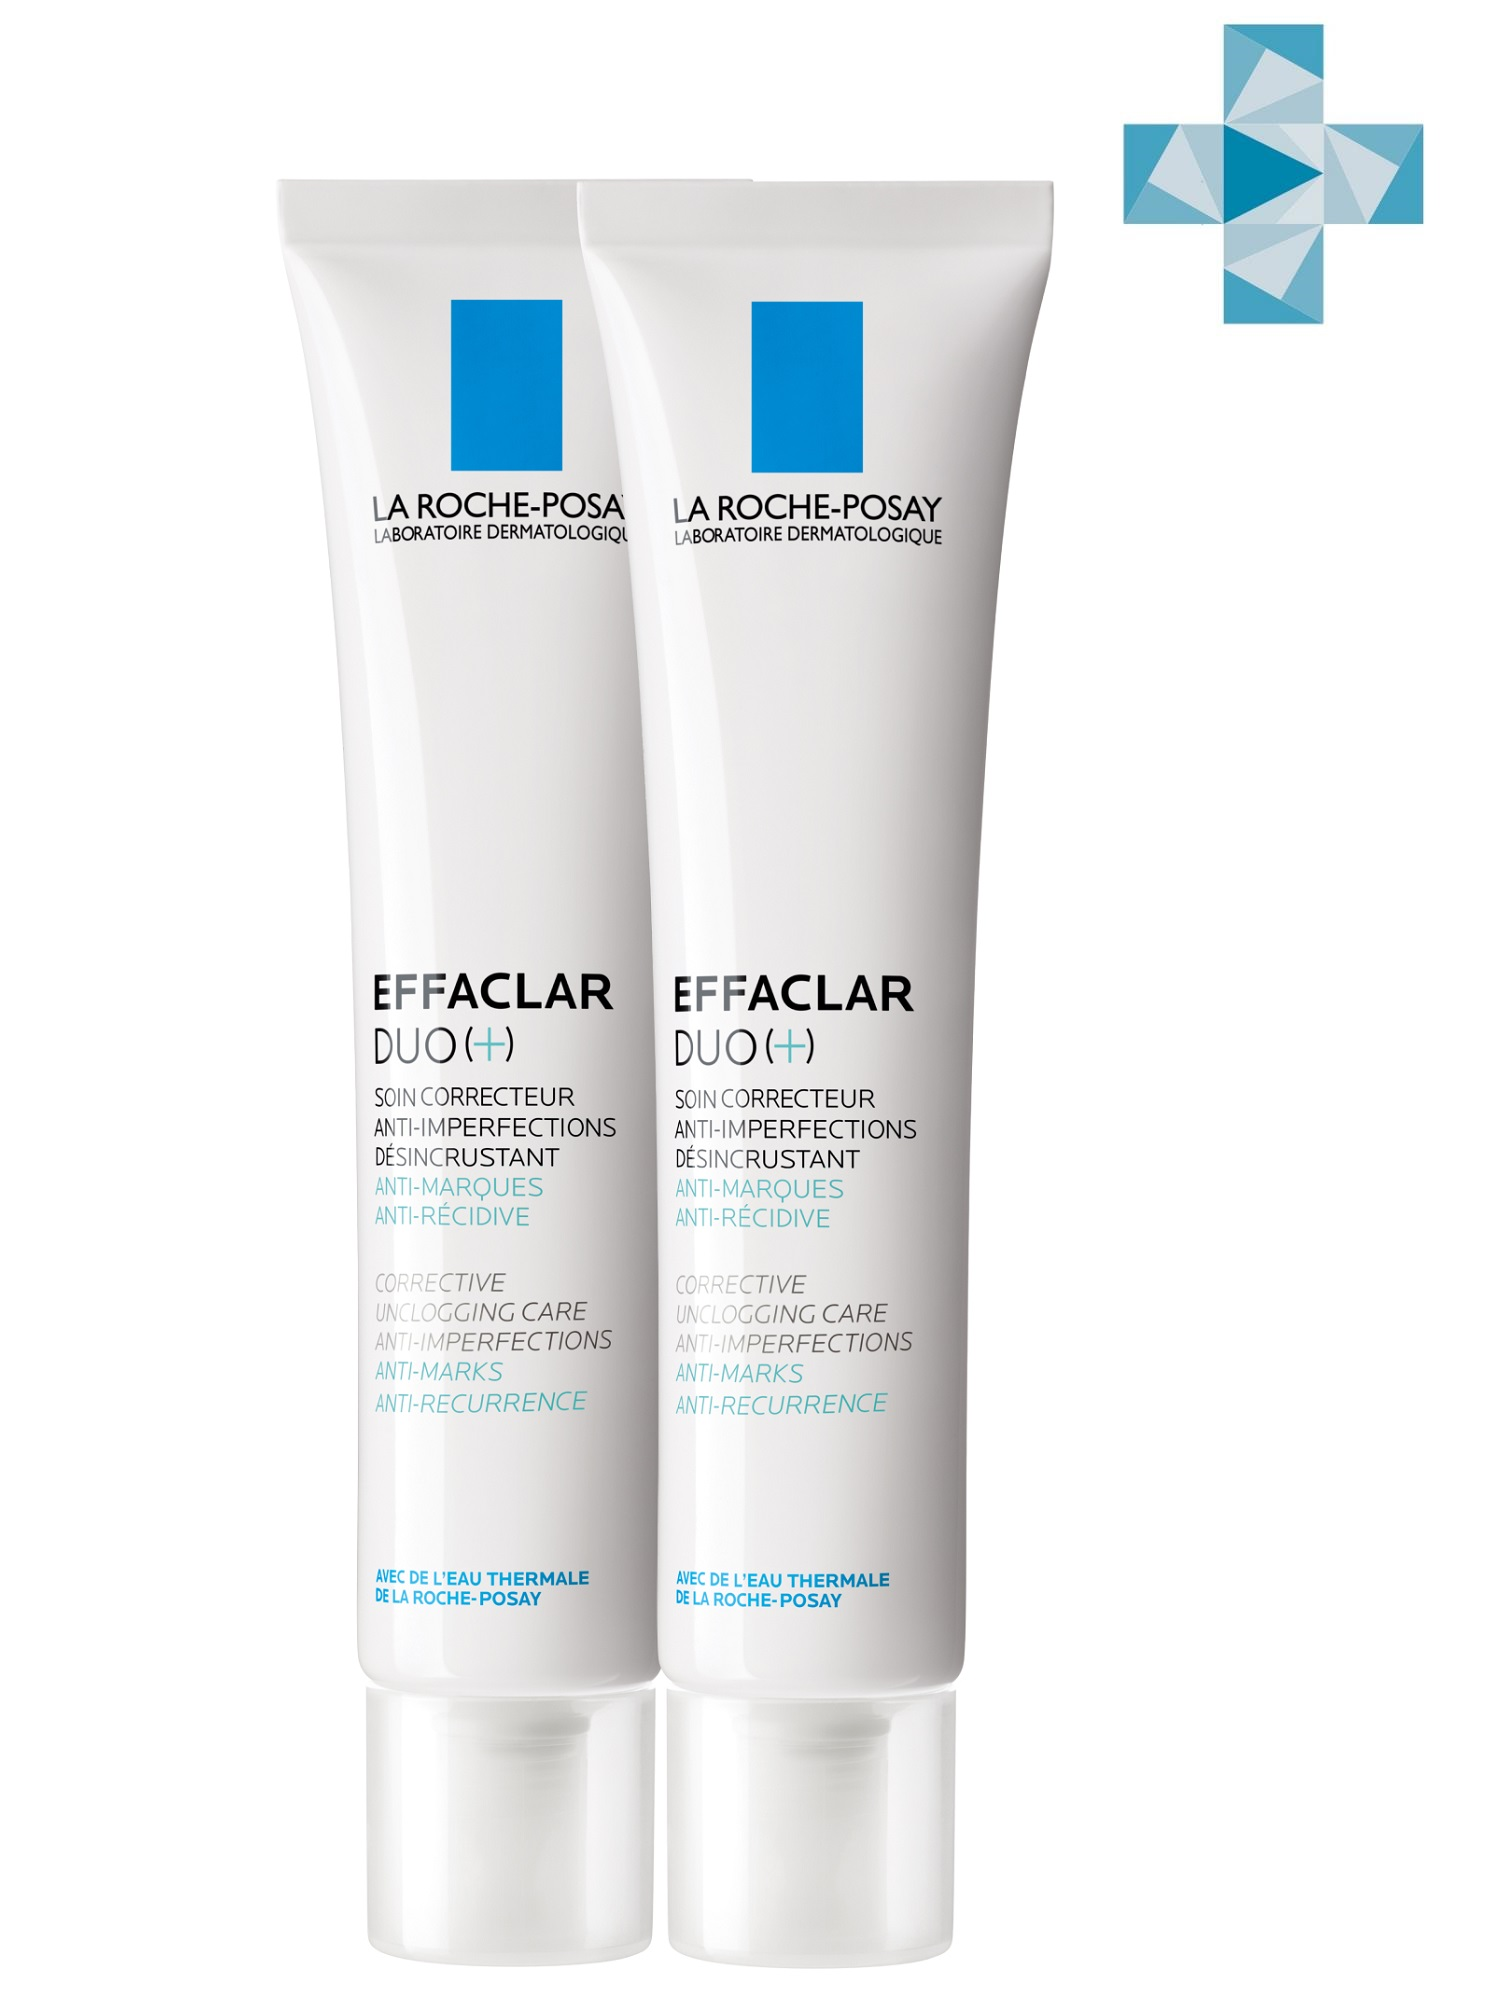 Купить La Roche-Posay Набор Эфаклар ДУО[+] Корректирующий крем-гель для проблемной кожи 2 шт х 40 мл (La Roche-Posay, Effaclar), Франция